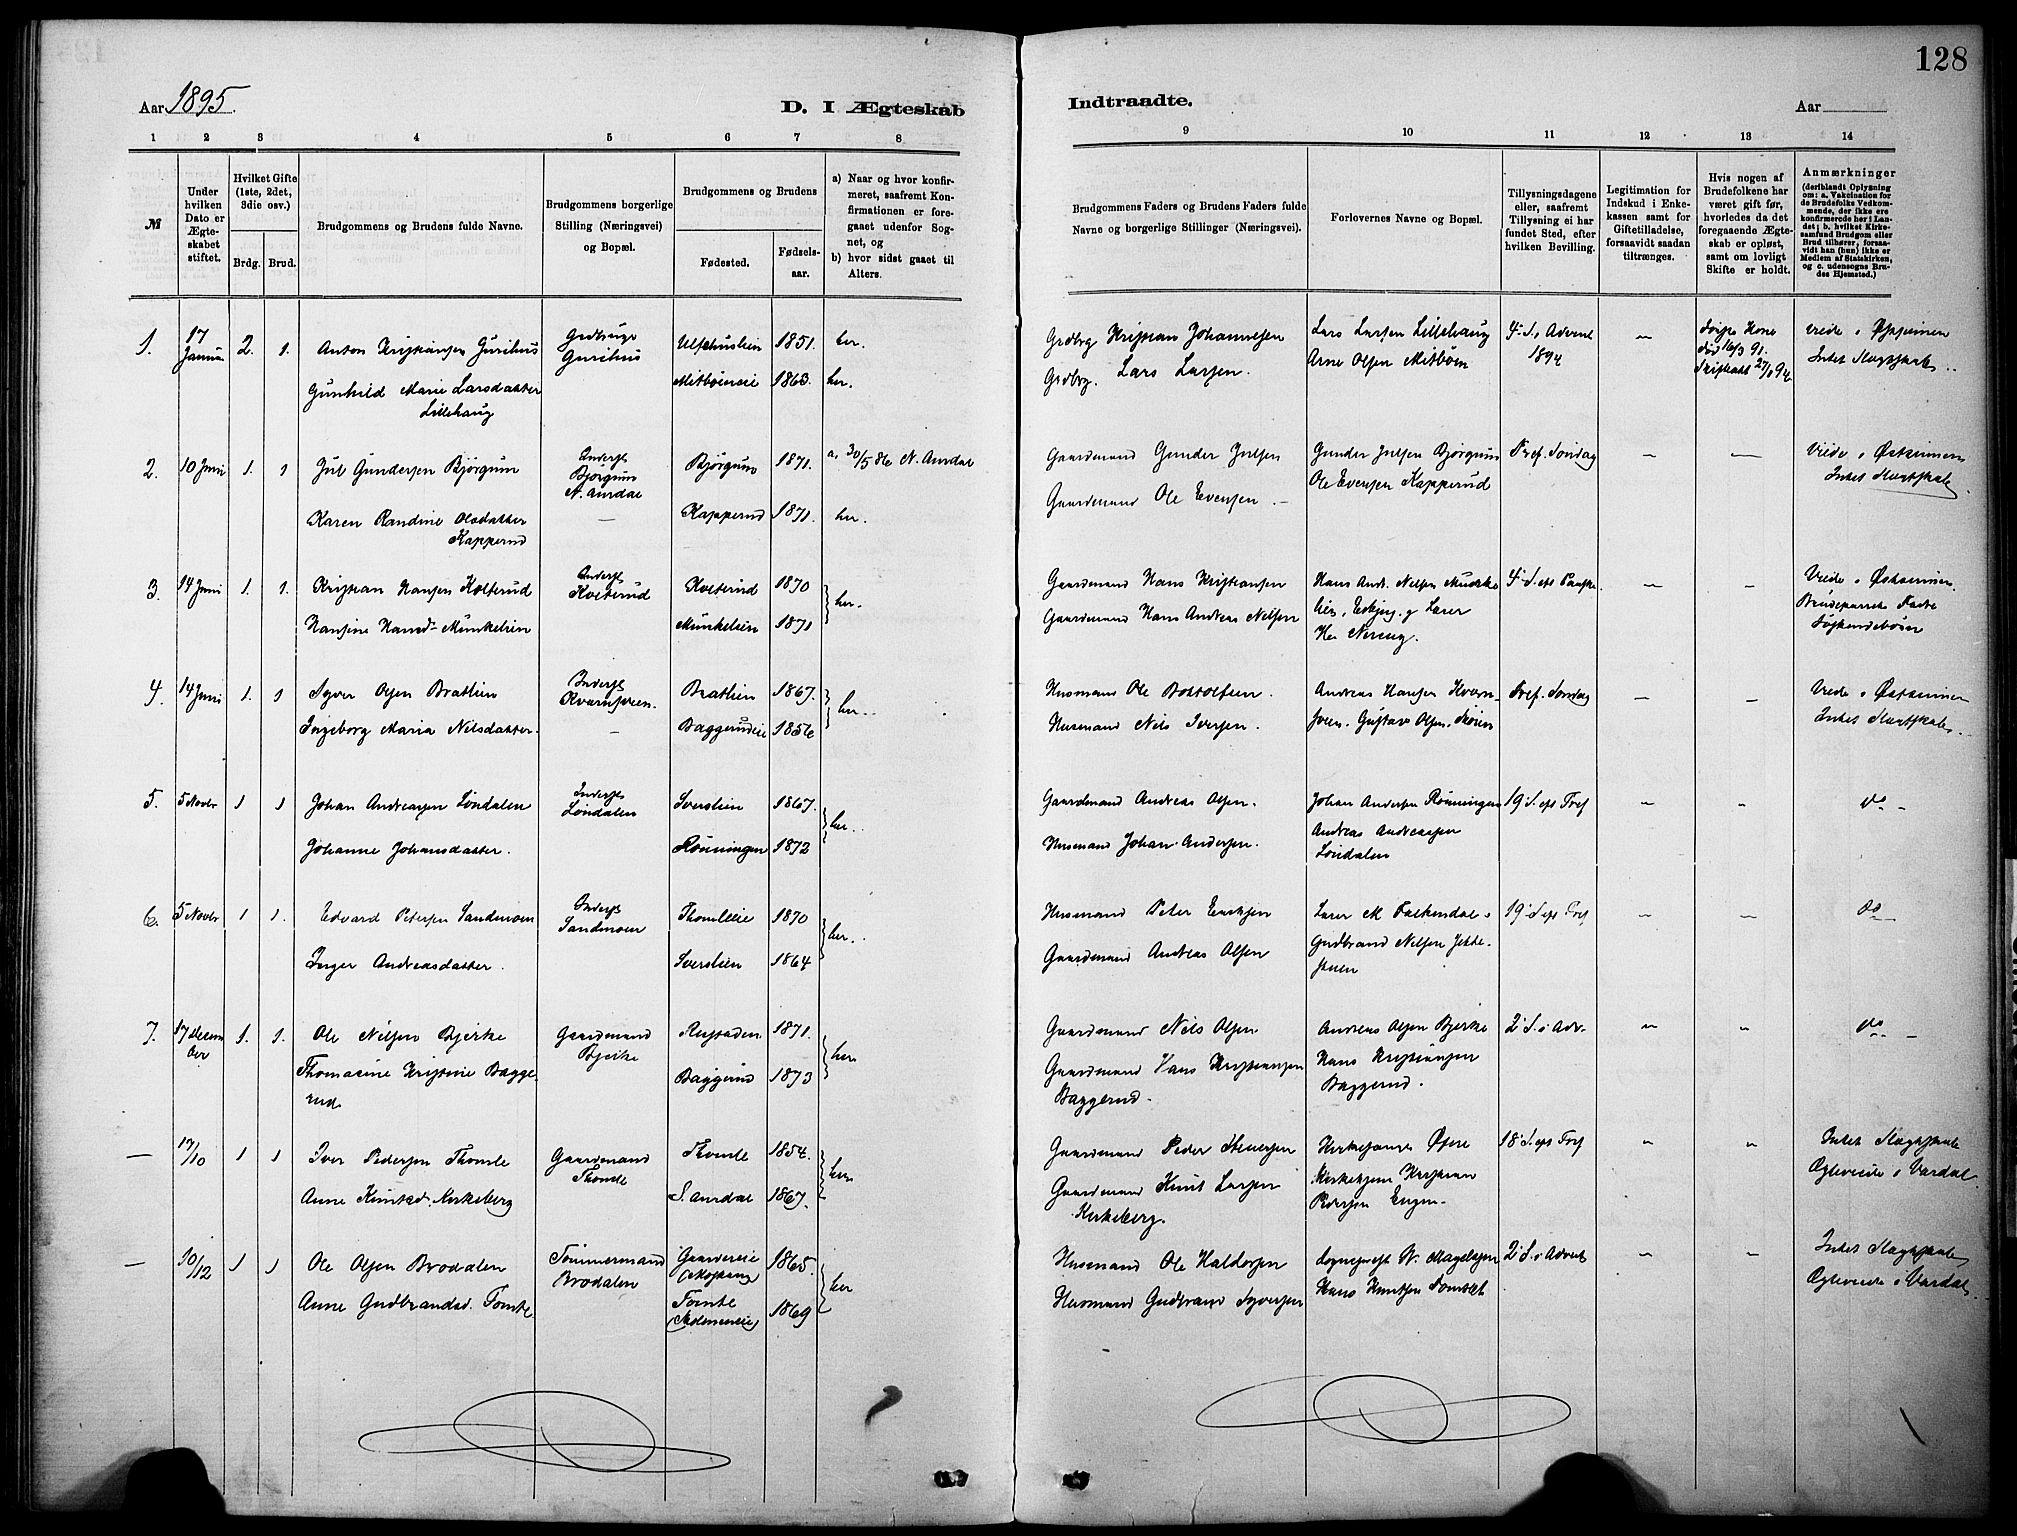 SAH, Nordre Land prestekontor, Ministerialbok nr. 5, 1882-1903, s. 128